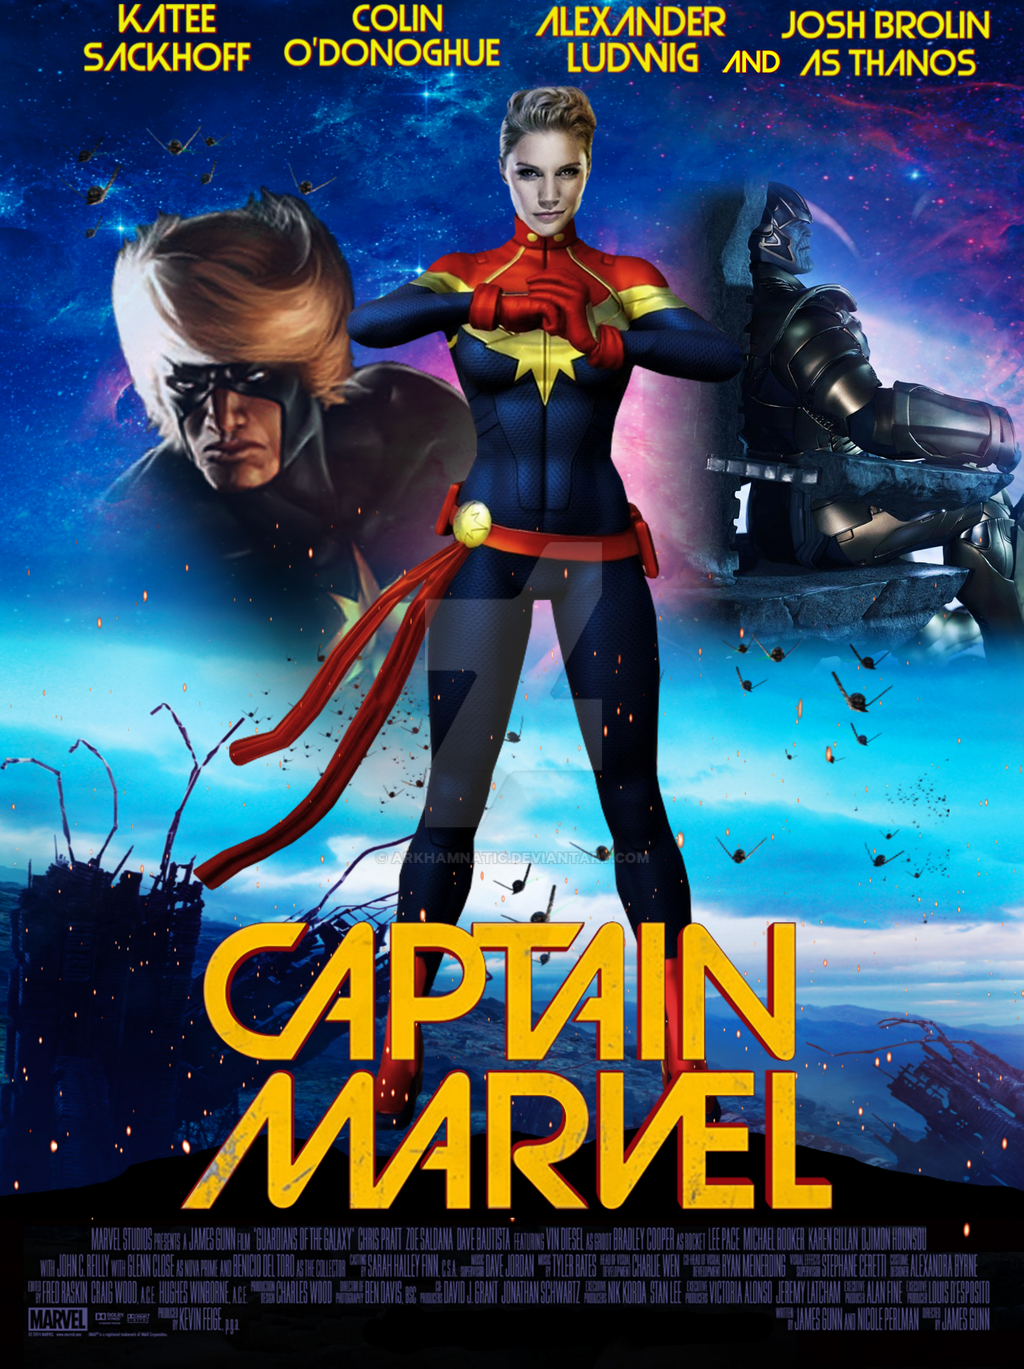 captain marvel movie poster by arkhamnatic on deviantart